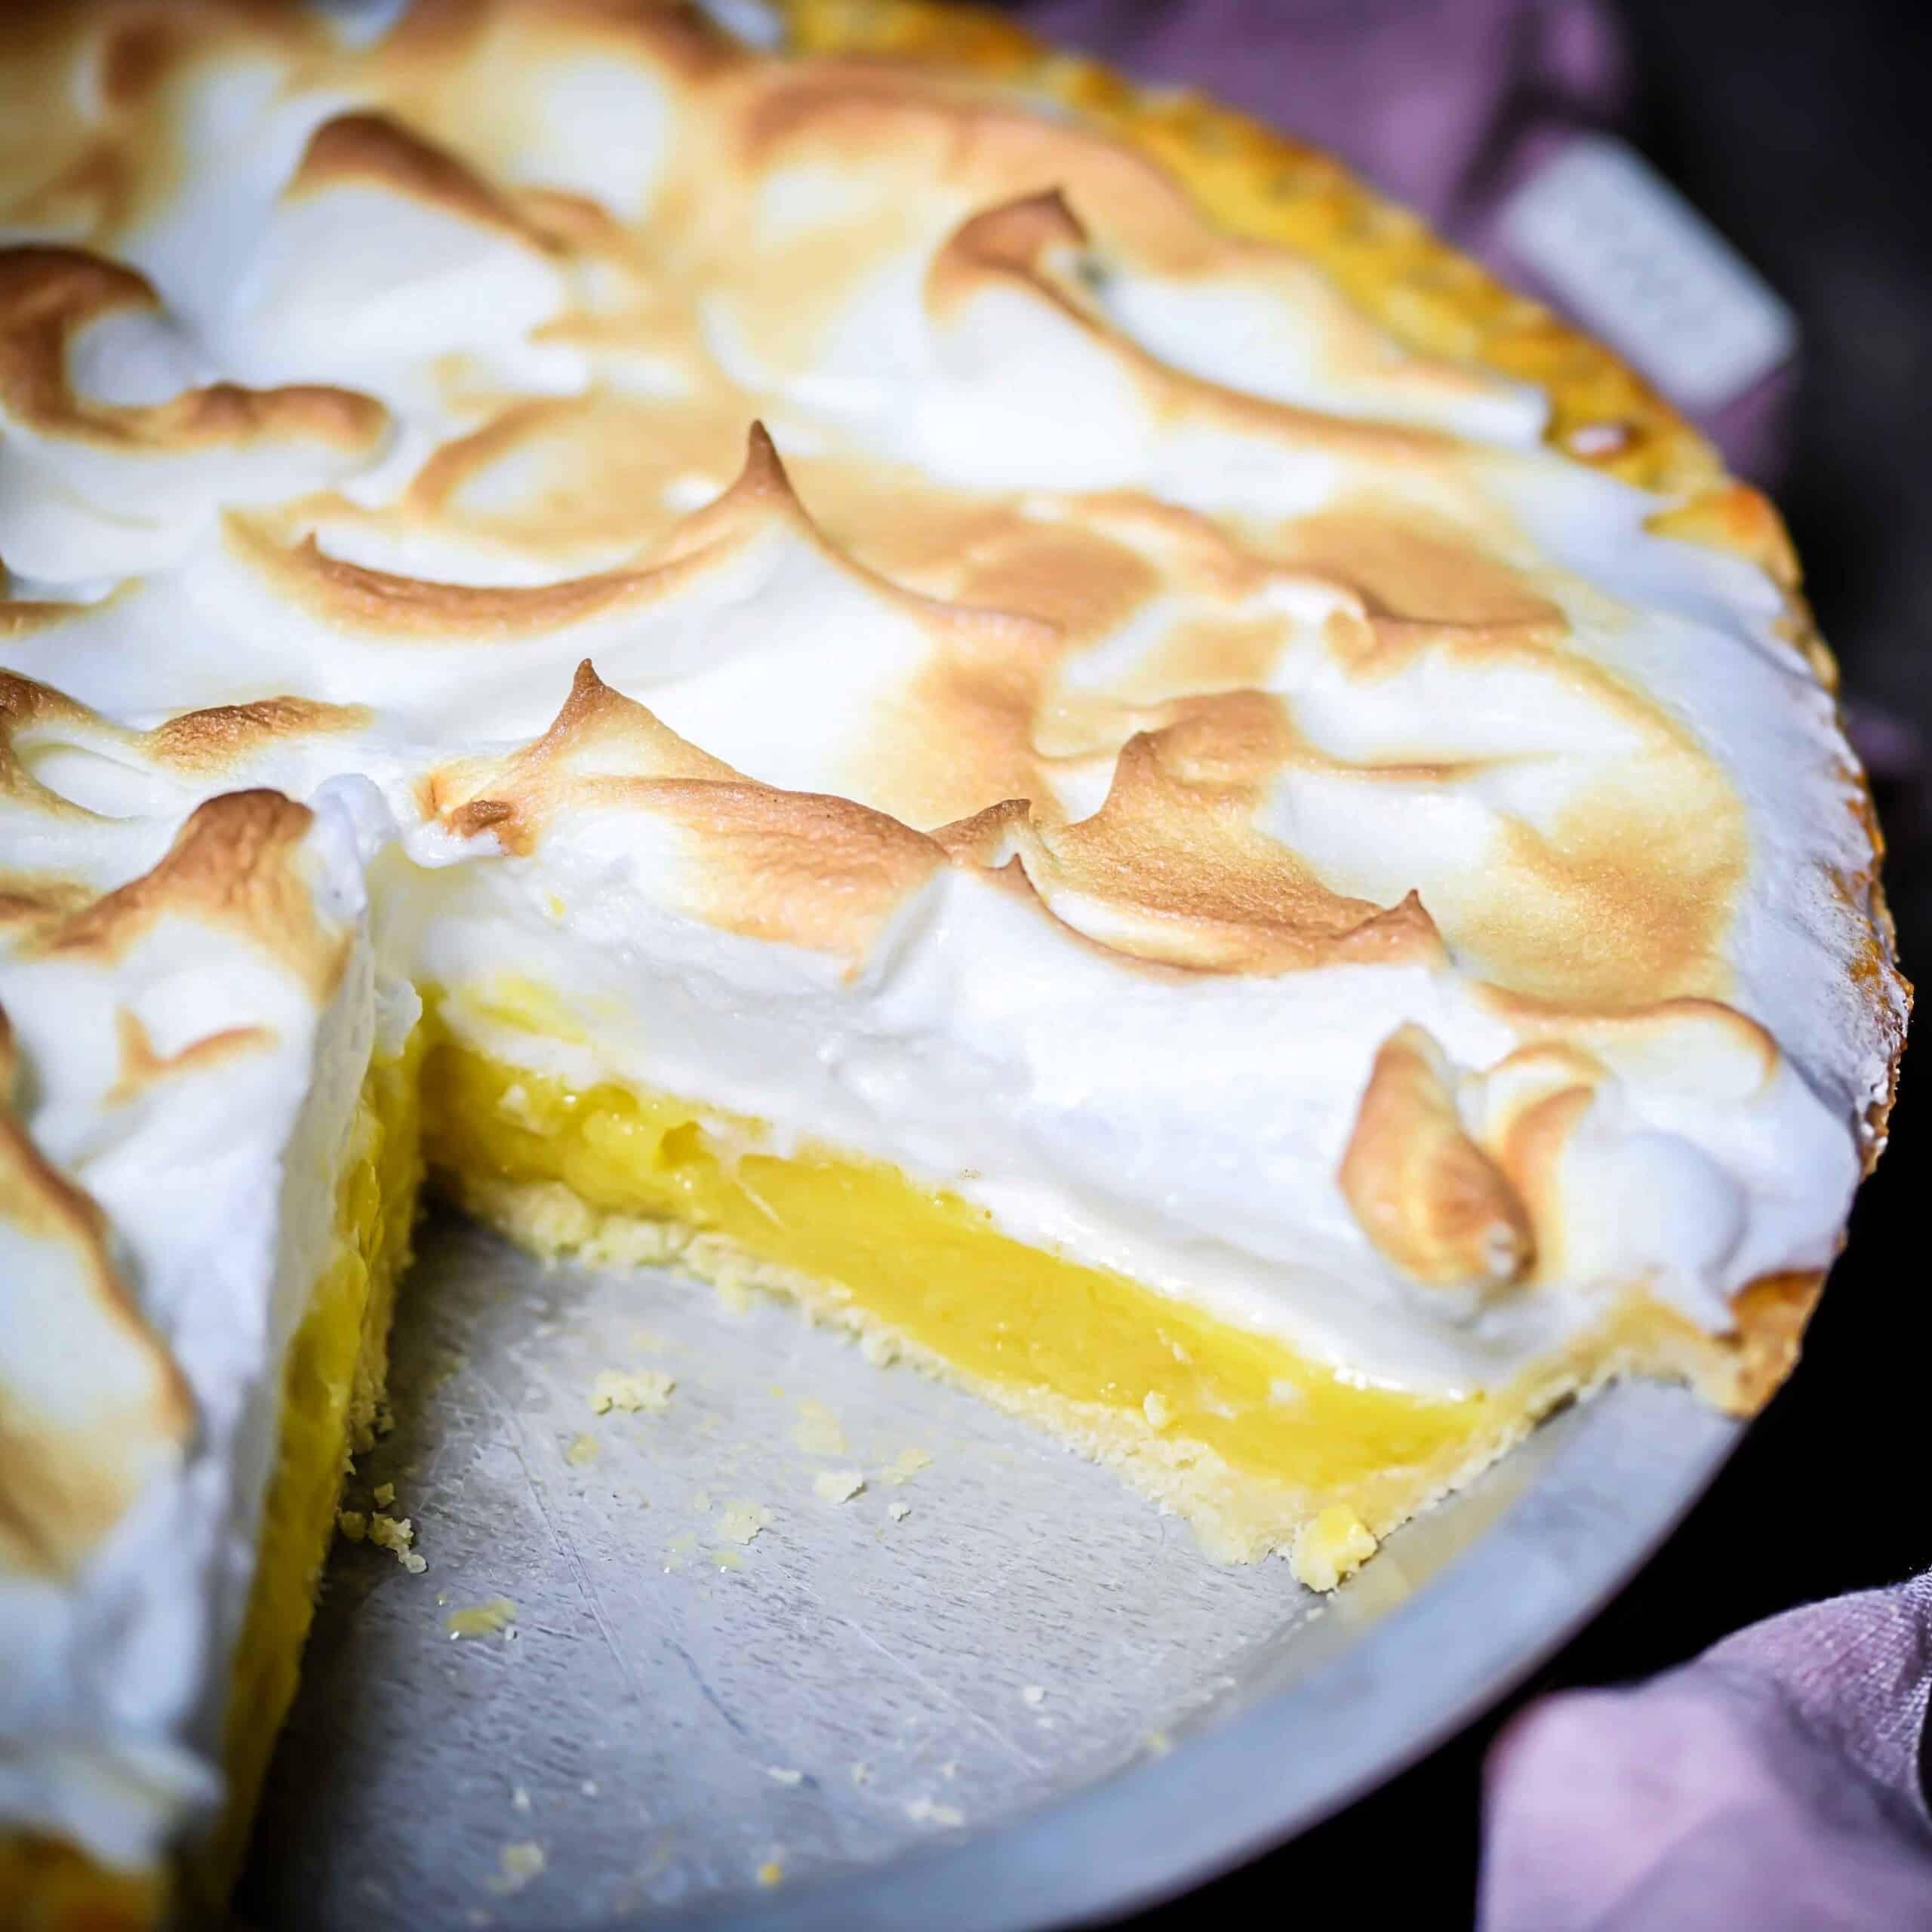 Lemon Meringue Pie gluten-free